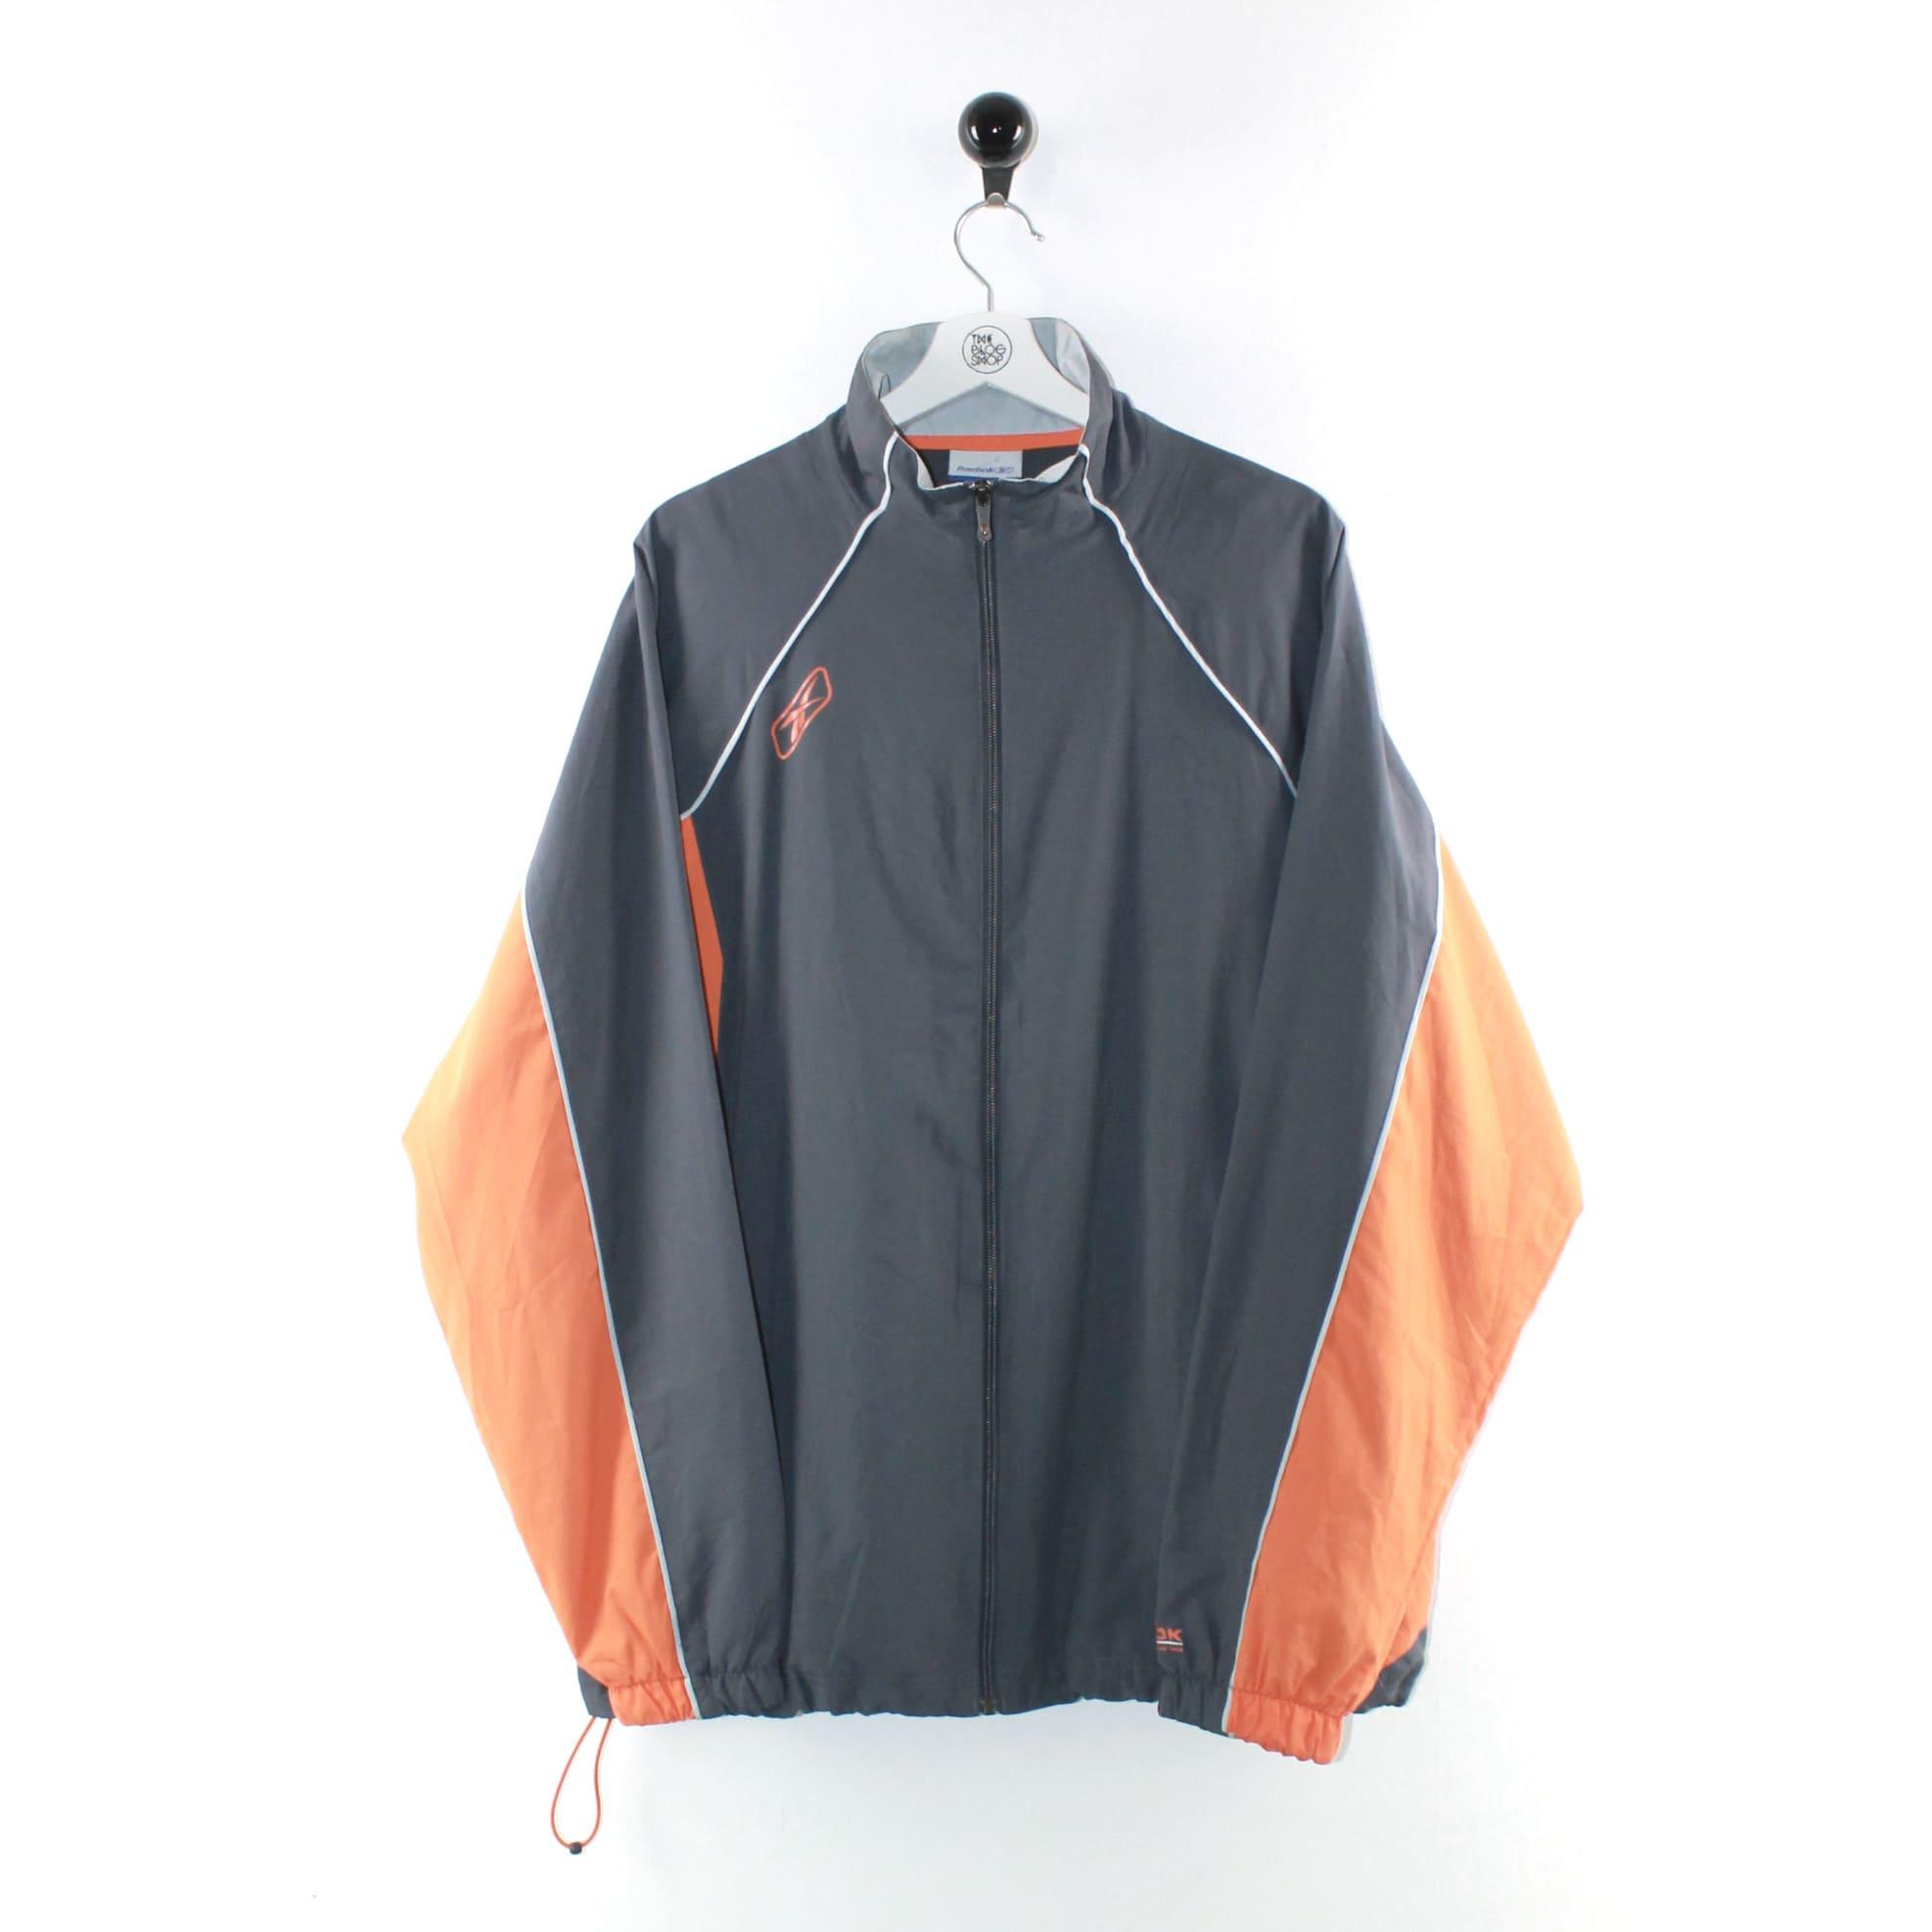 Reebok - Track jacket